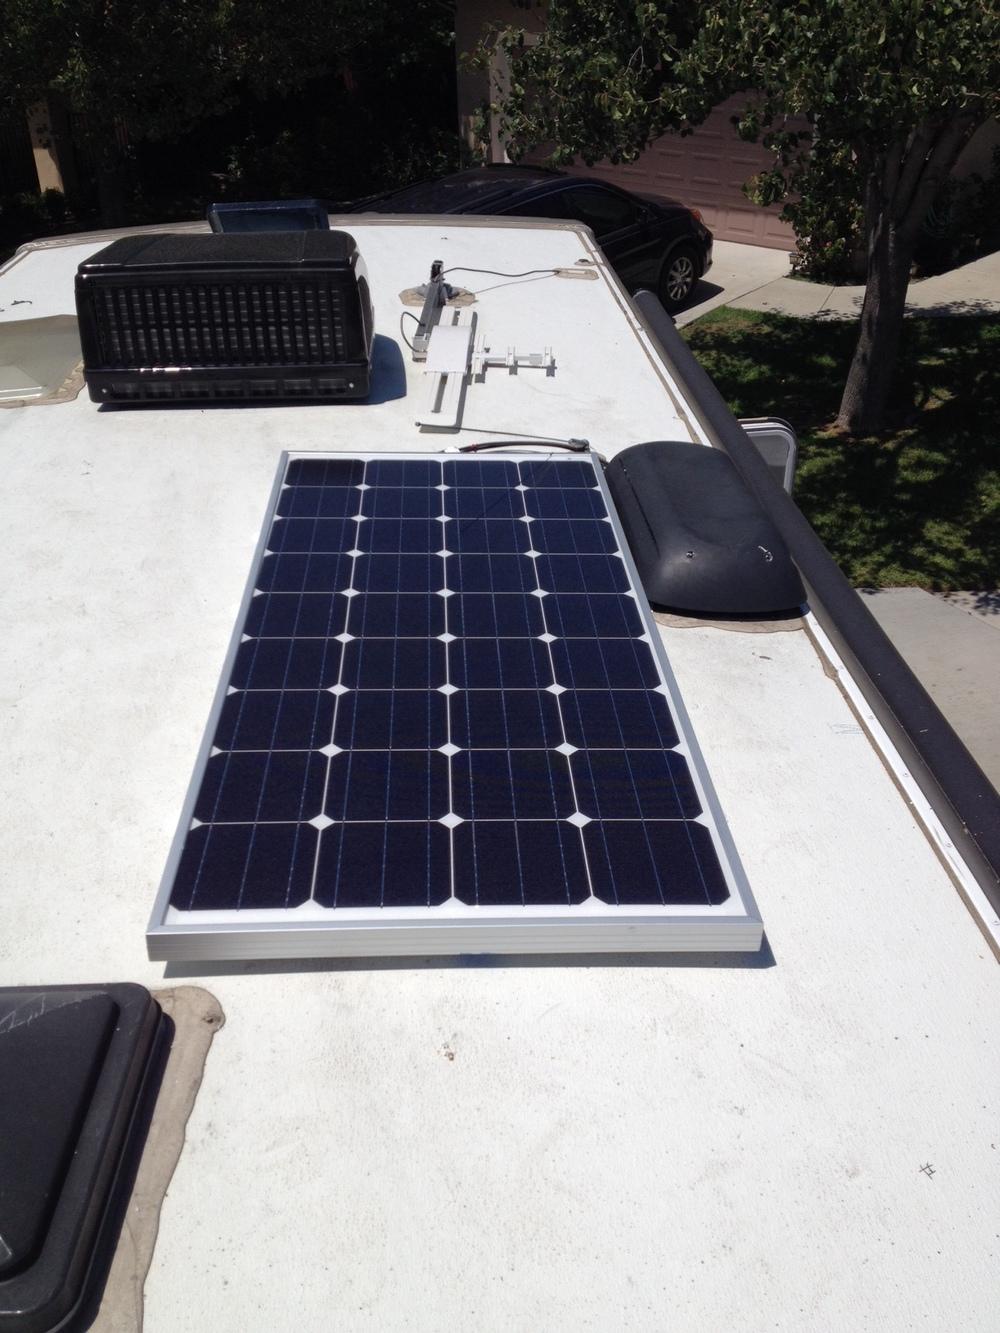 160 watt panel mounted on the roof.